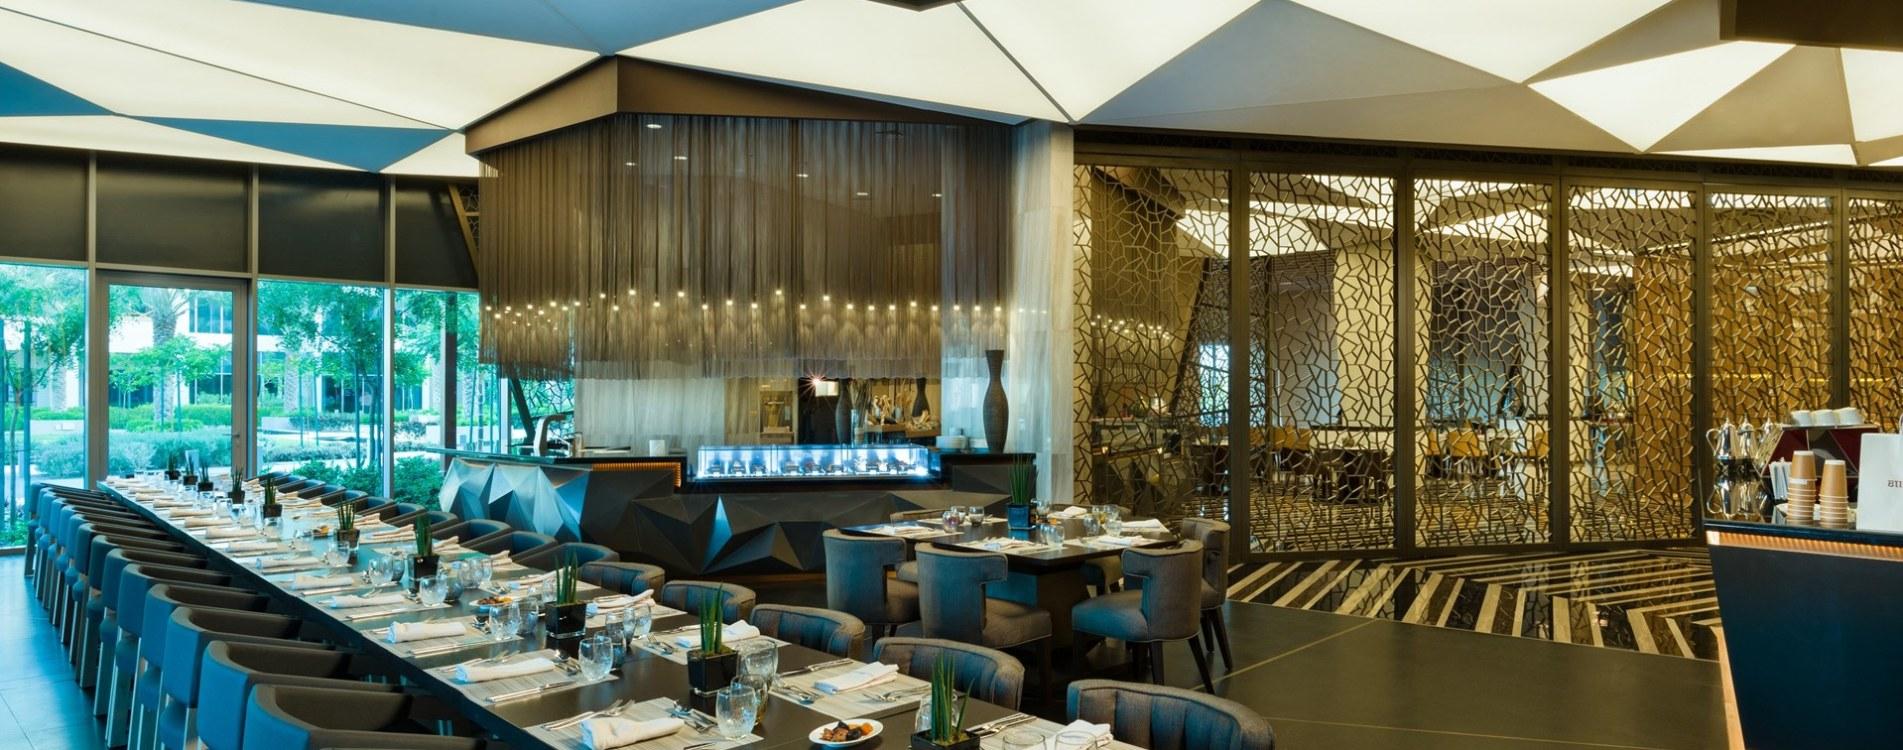 Kempinski-Hotel-Muscat-Cafe-One-Restaurant-Interior-Oman